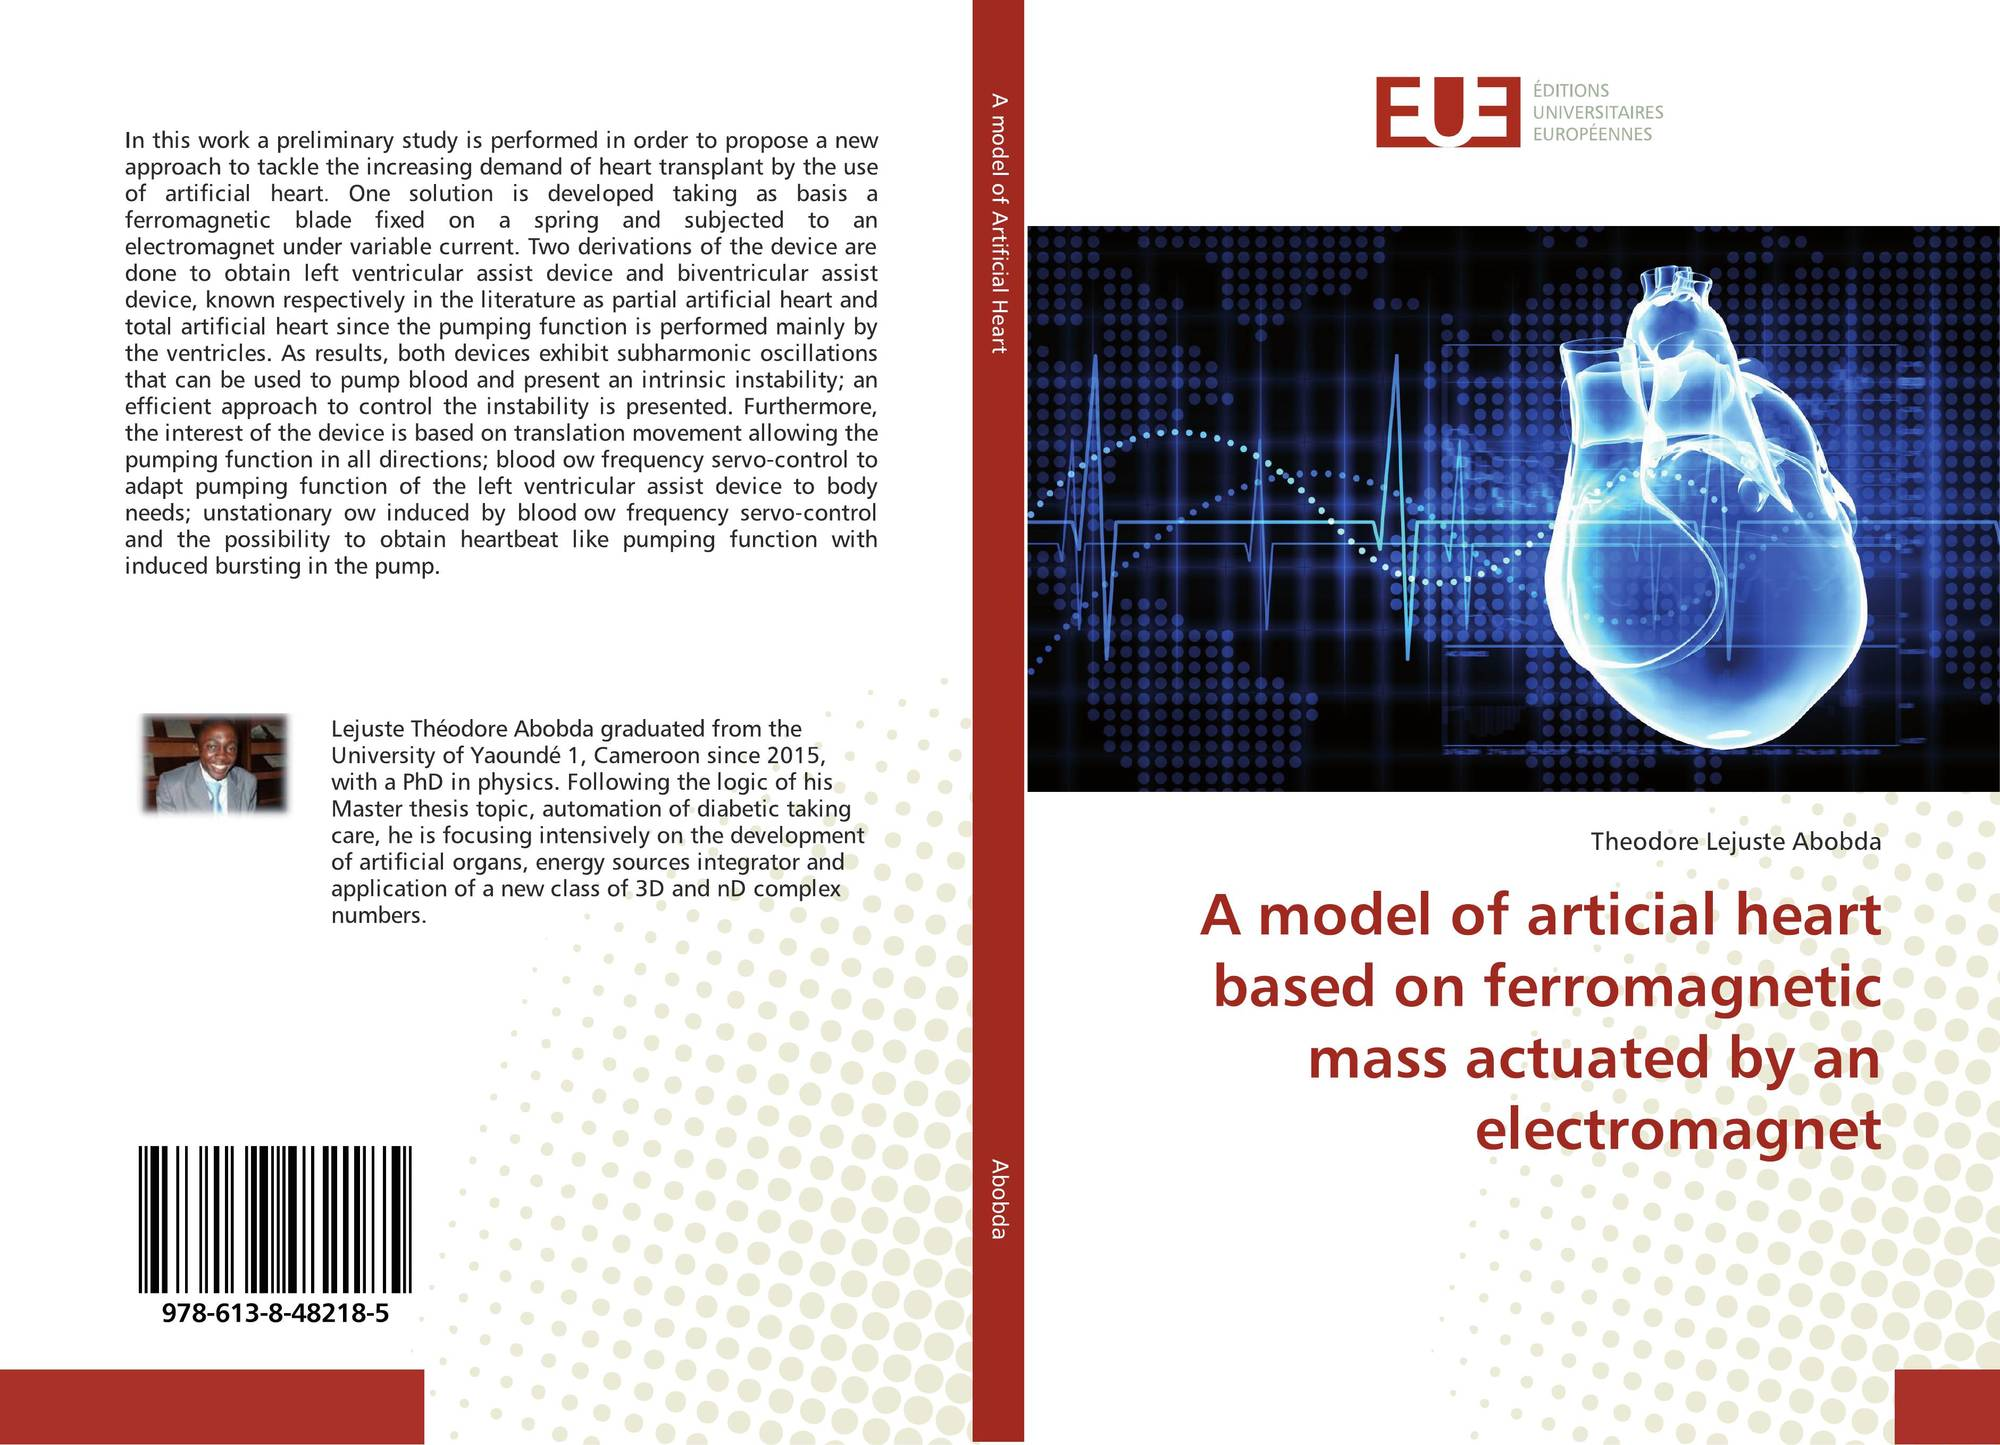 A model of articial heart based on ferromagnetic mass